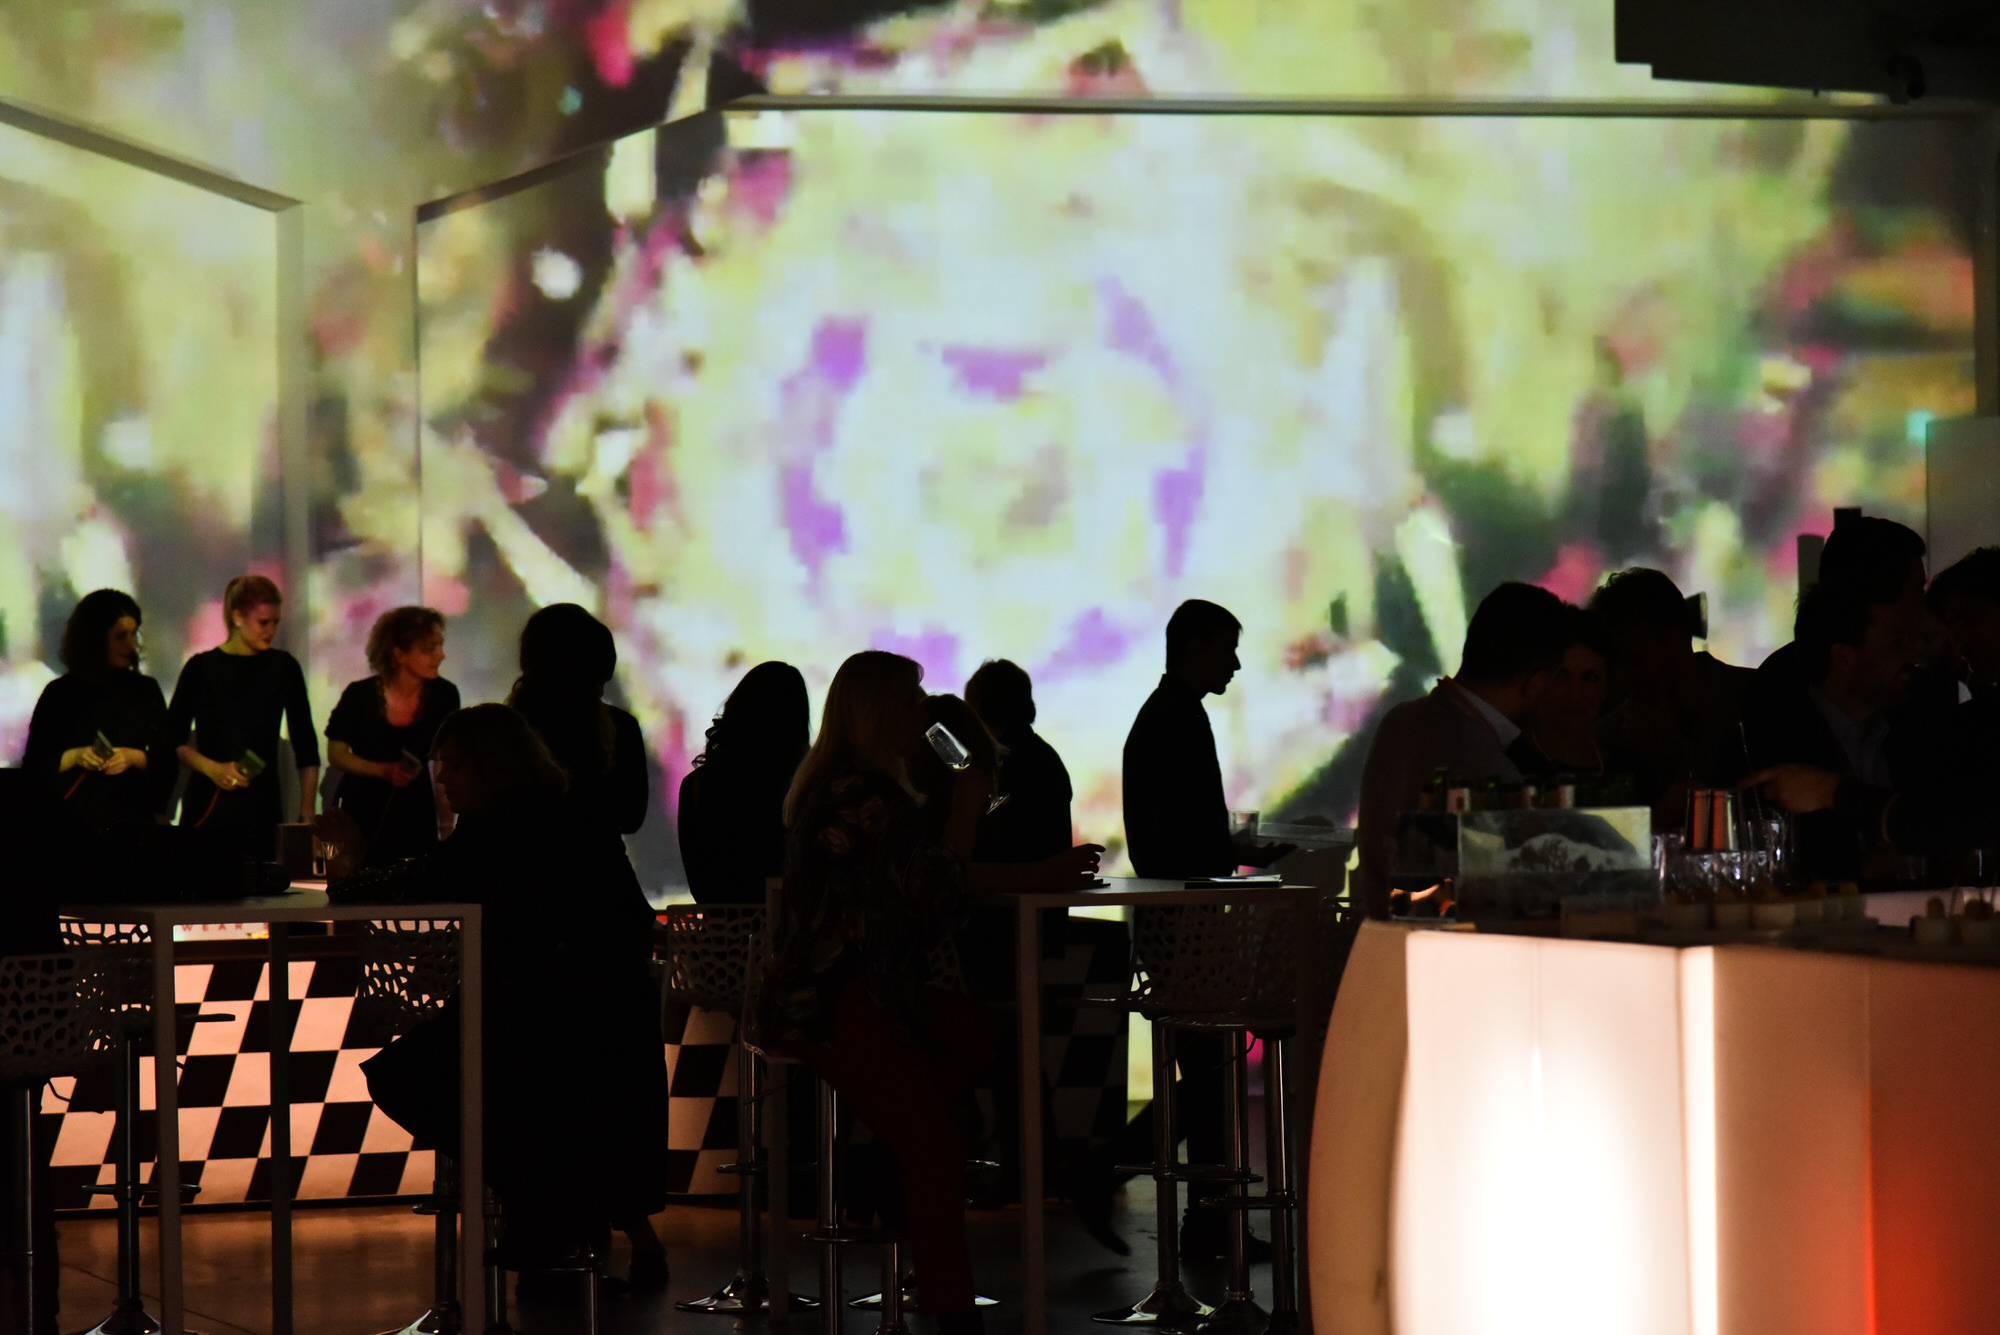 global-partners-dinner-carrera-gruppo-peroni-eventi-12